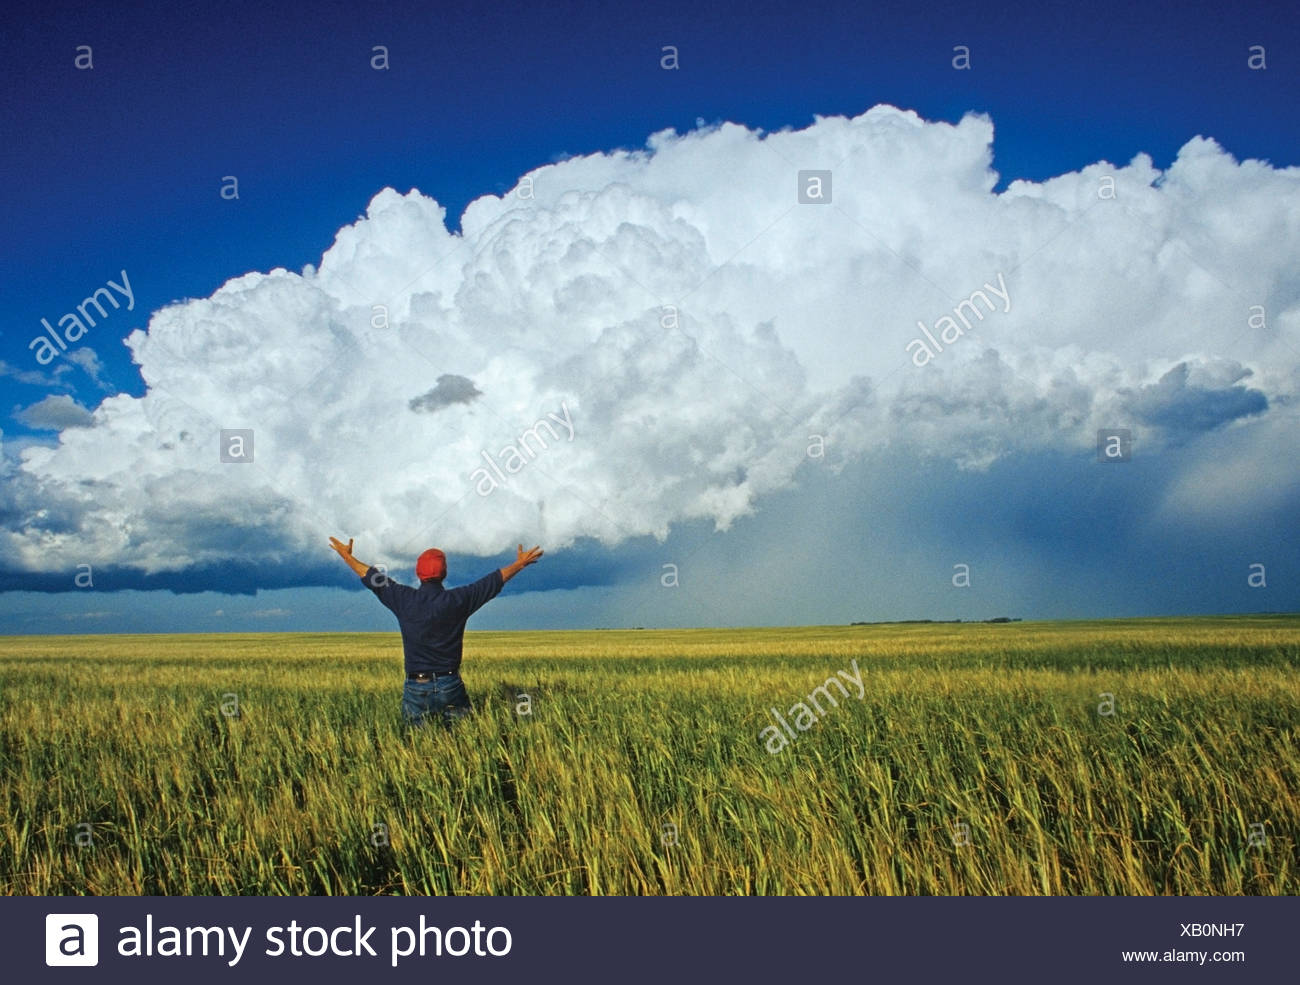 A farmer looks out over a barley field with a cumulonimbus cloud mass in the background near Bromhead, Saskatchewan, Canada Stock Photo